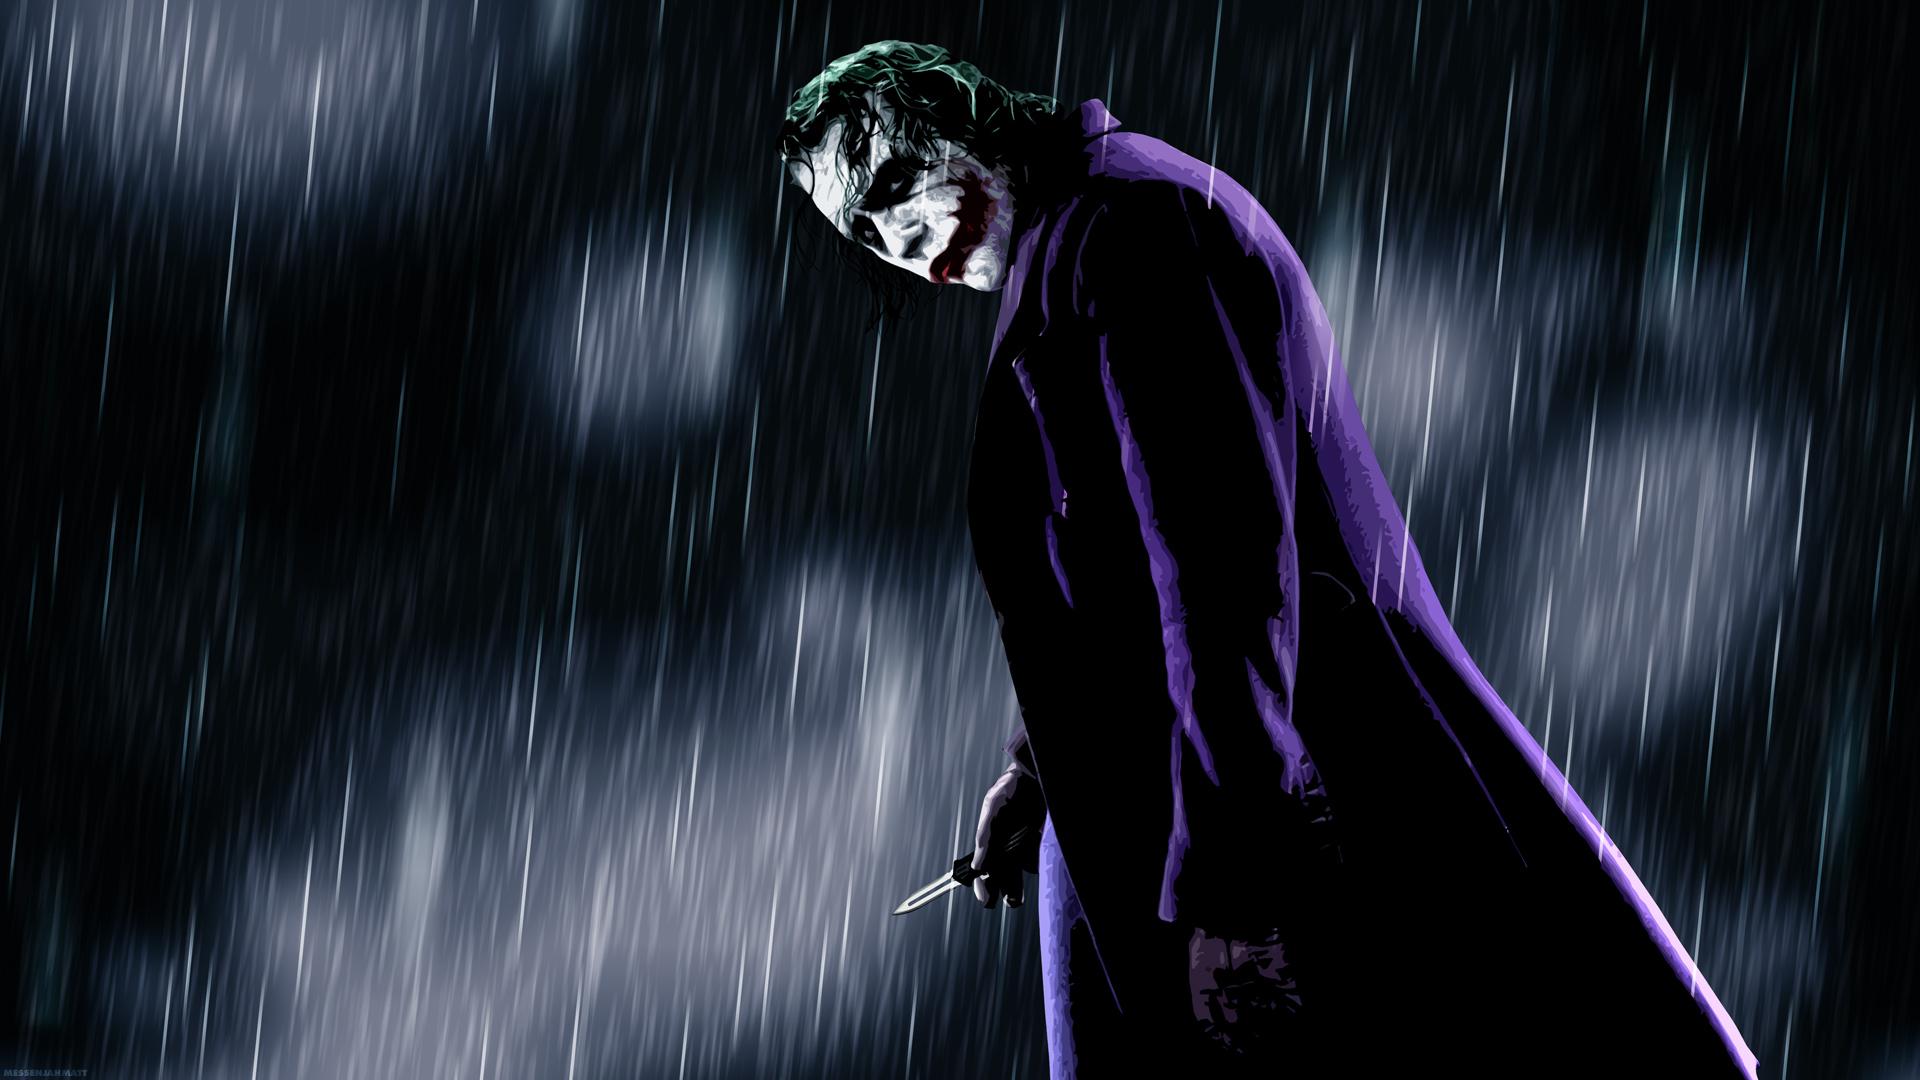 joker   The Joker Wallpaper 28092695 1920x1080